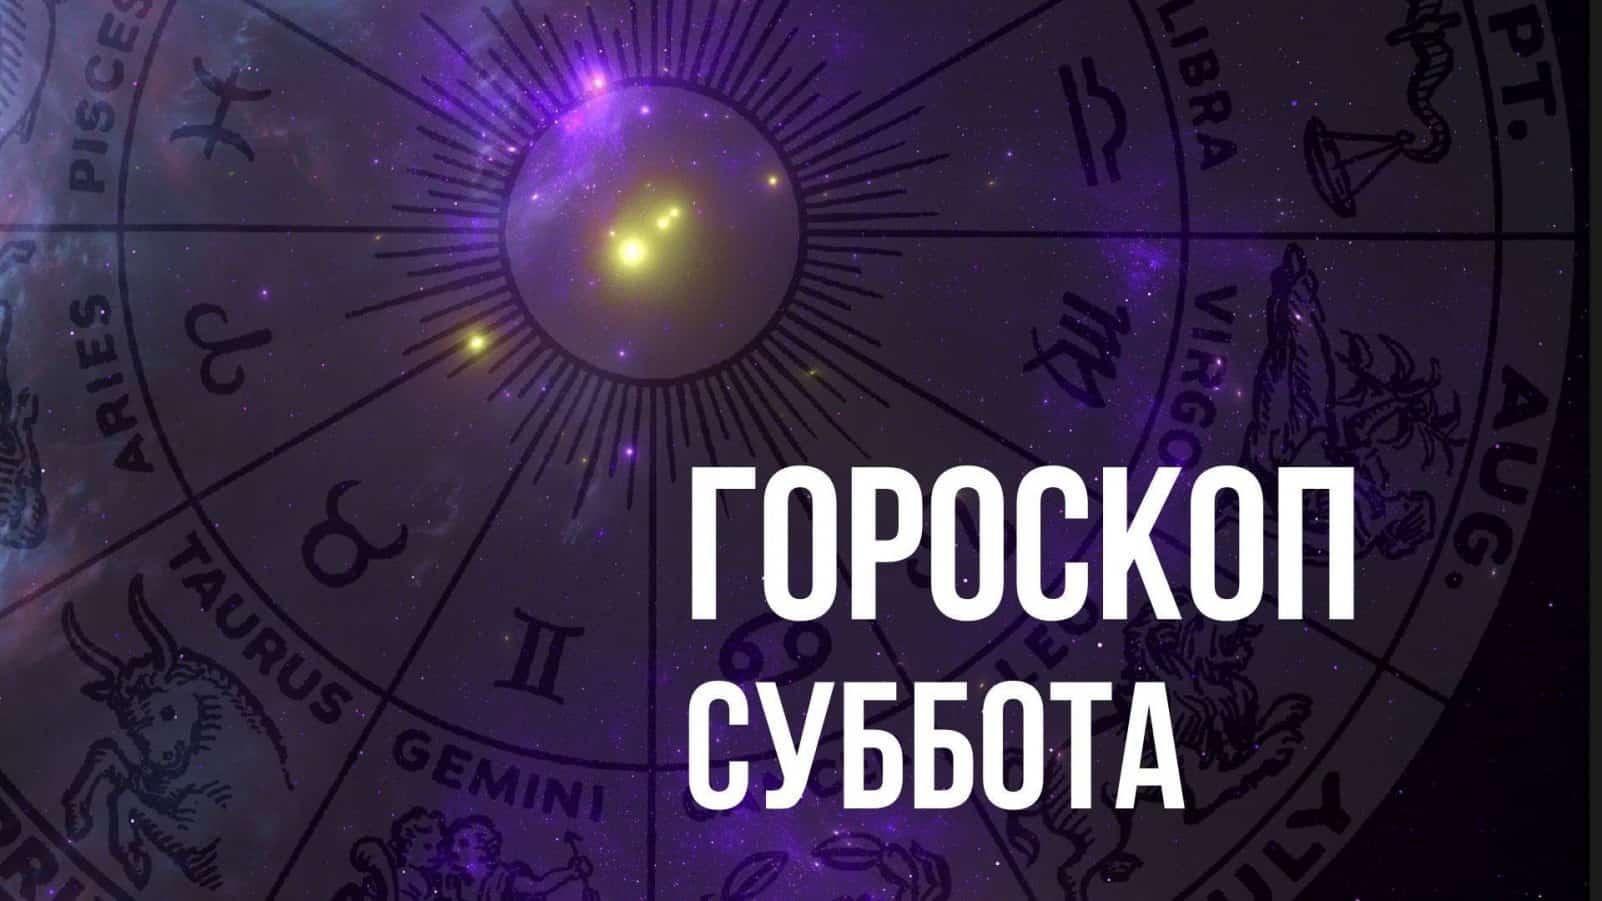 Гороскоп на субботу 12 июня для каждого знака Зодиака